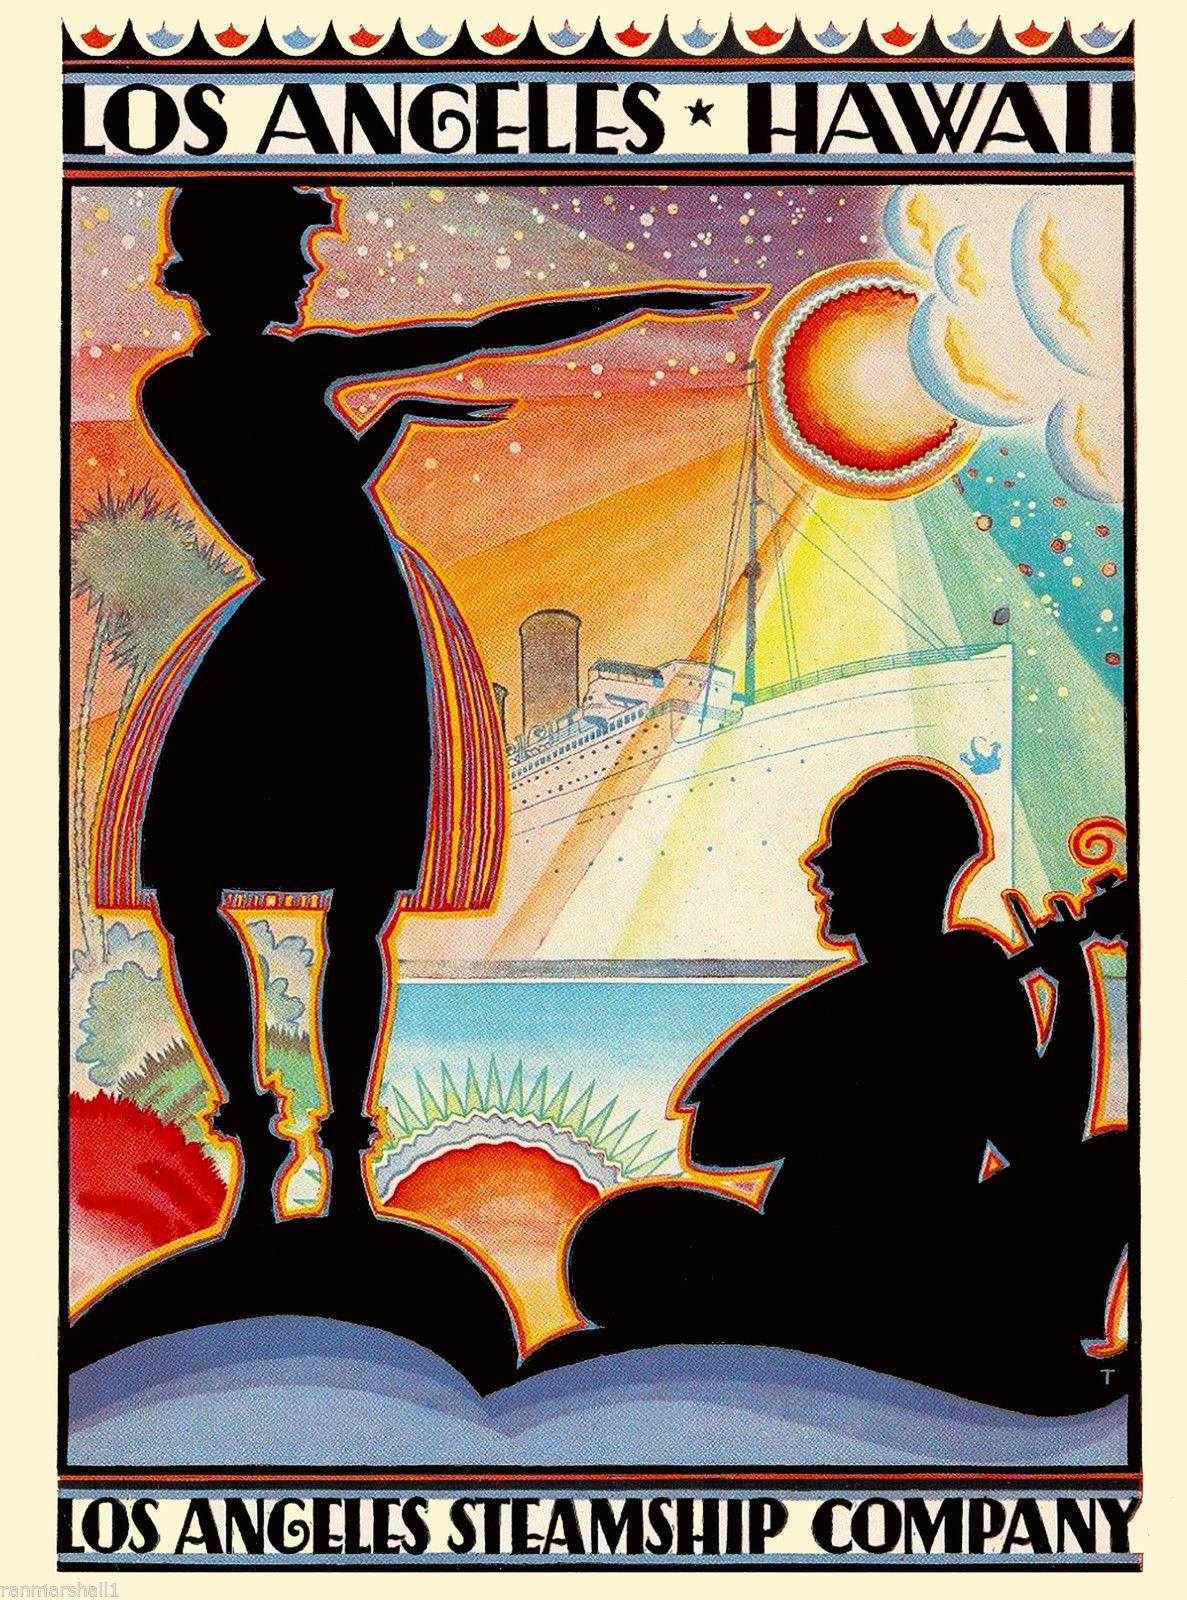 Hawaii Los Angeles California United States America Travel Advertisement Poster   eBay